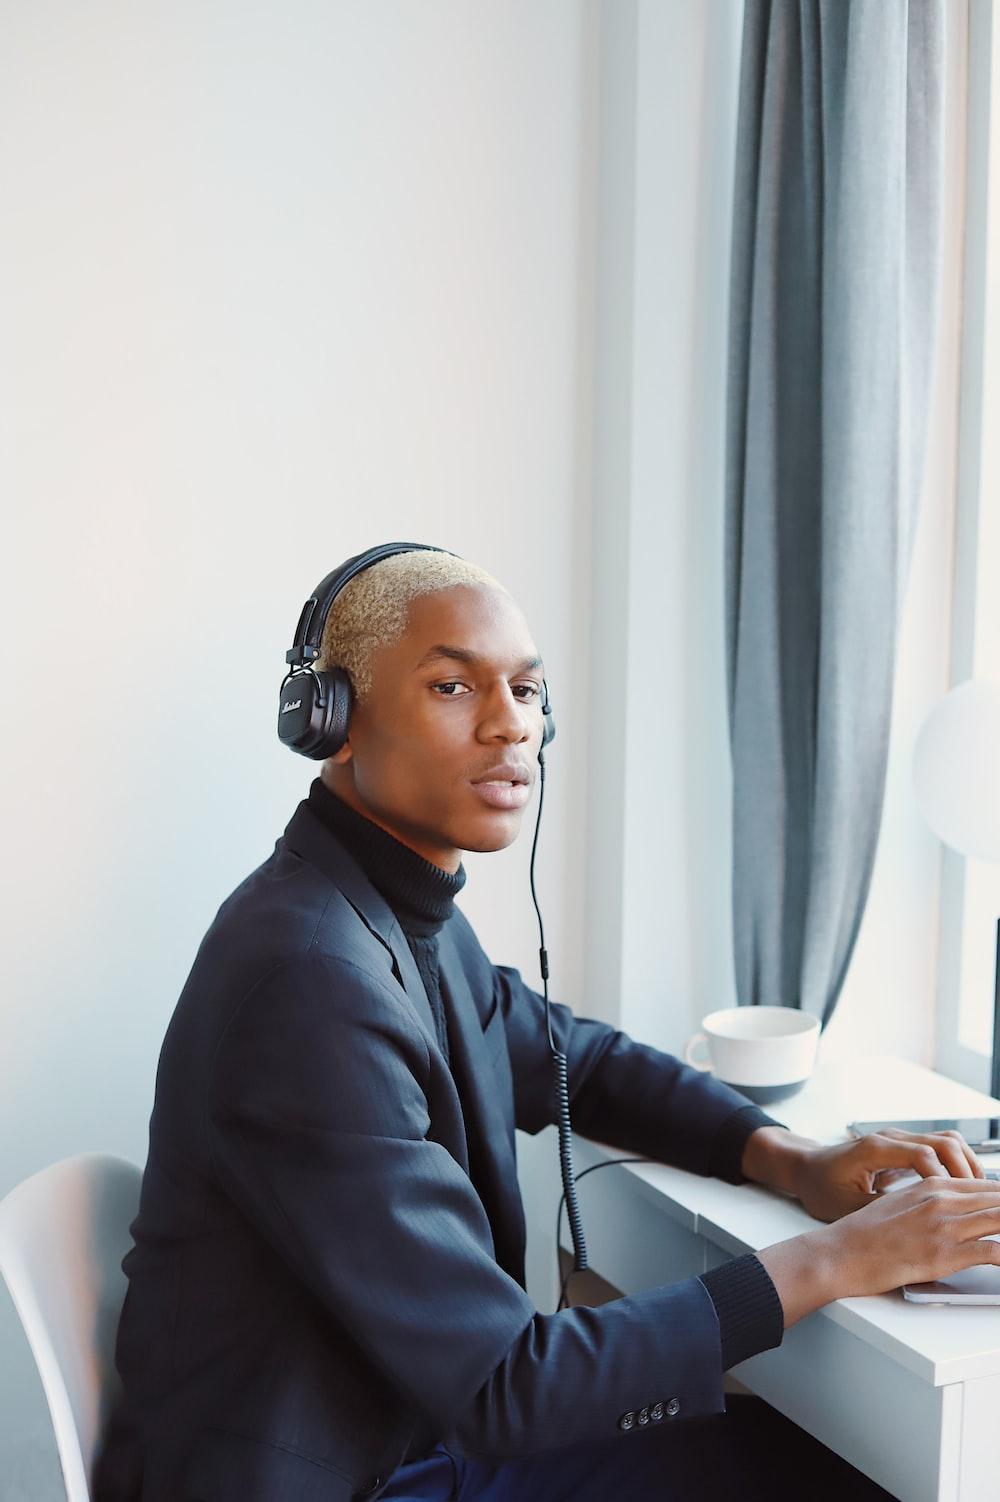 man in black dress shirt wearing headphones